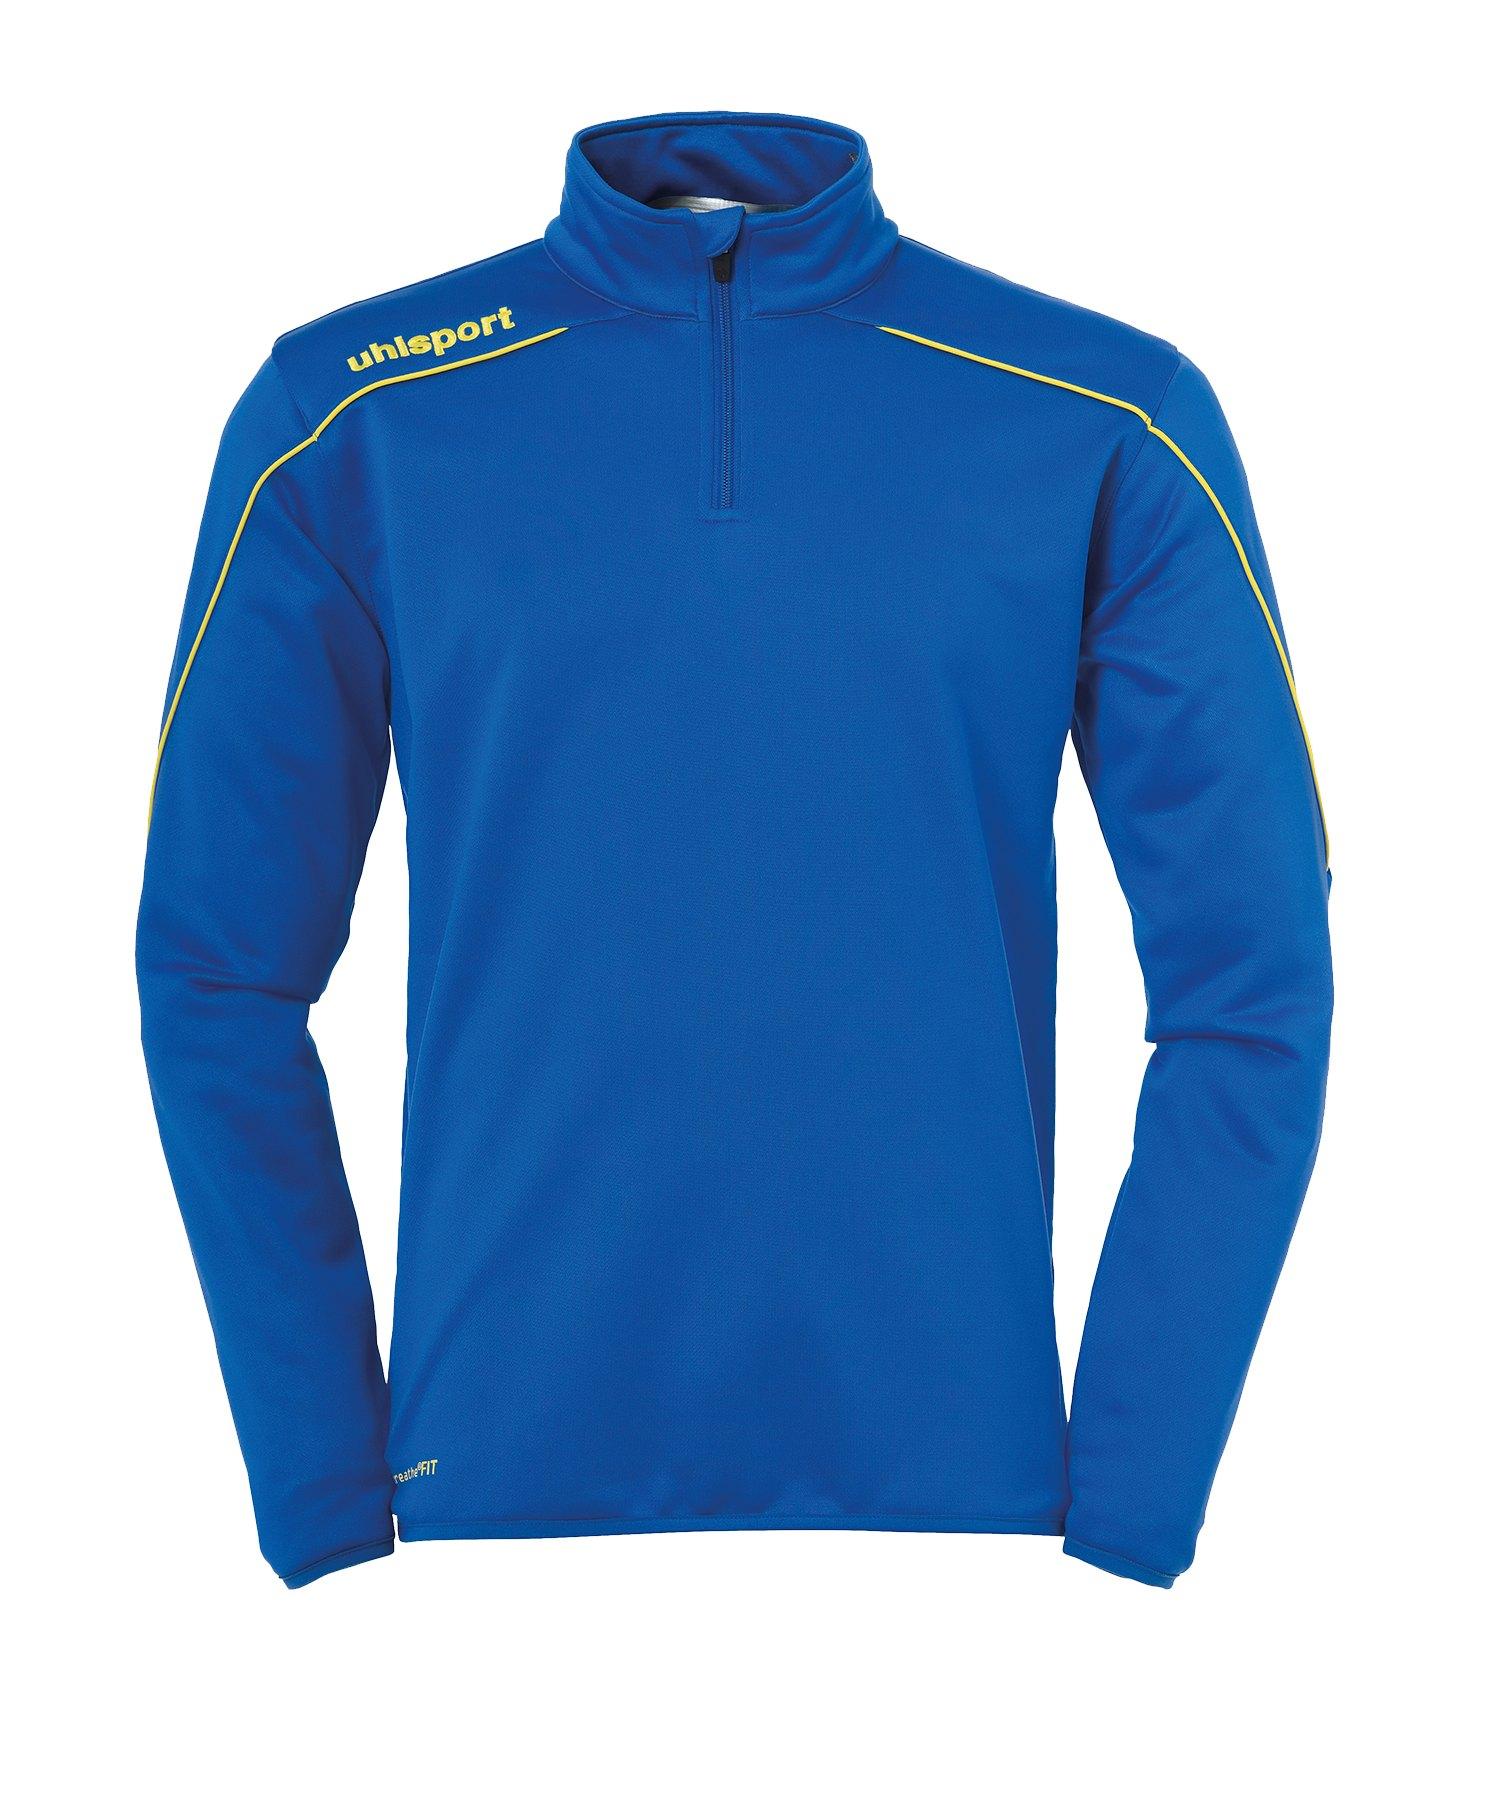 Uhlsport Stream 22 Ziptop Blau Gelb F14 - Blau